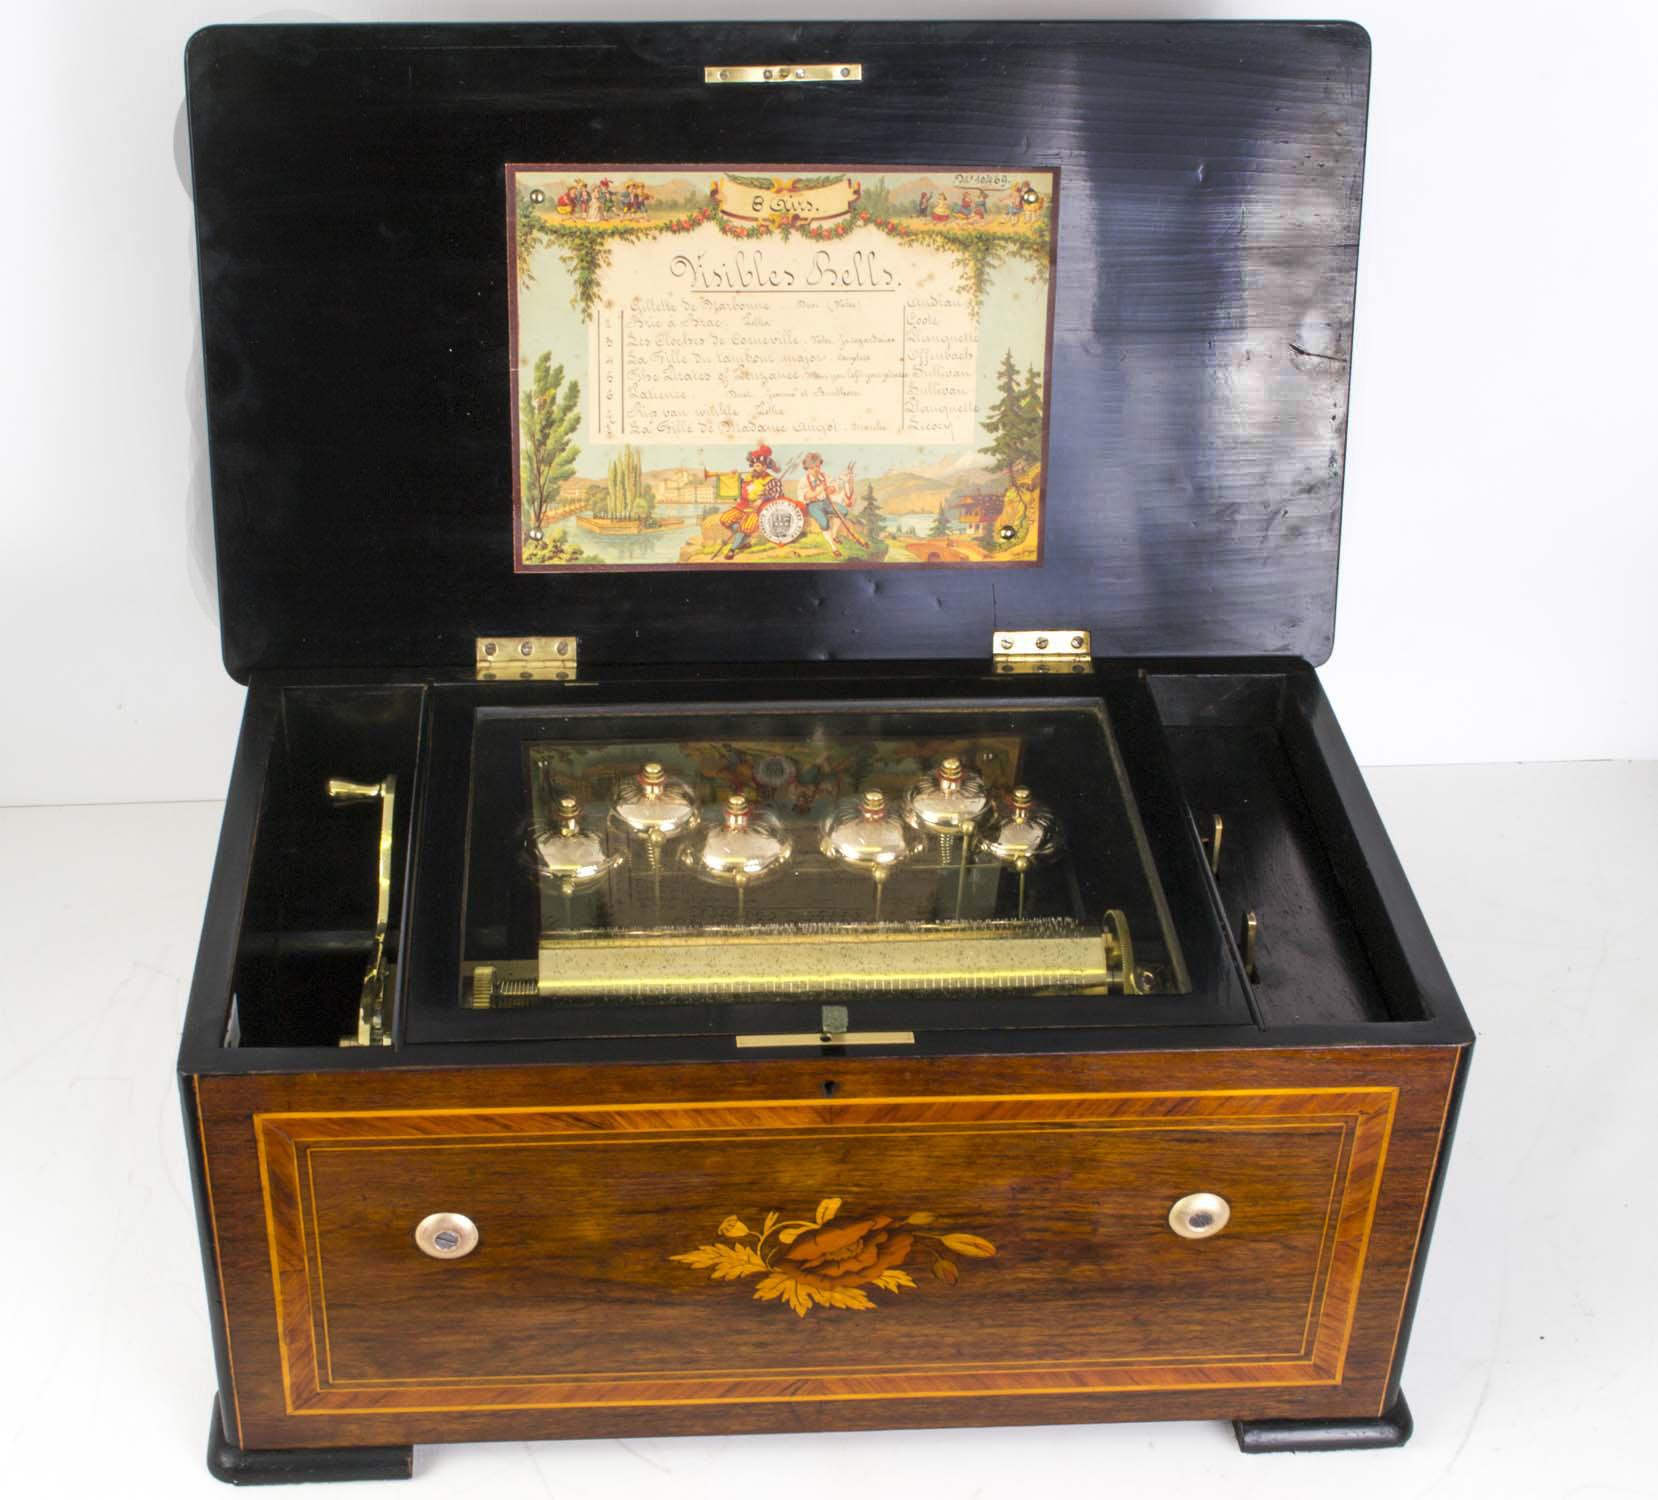 Regent Antiques Miscellaneous amp interesting Antique  : 06248 Antique Swiss 8 Air Rosewood Music Box 6 Bells c1890 1 from regentantiques.com size 1658 x 1500 jpeg 378kB